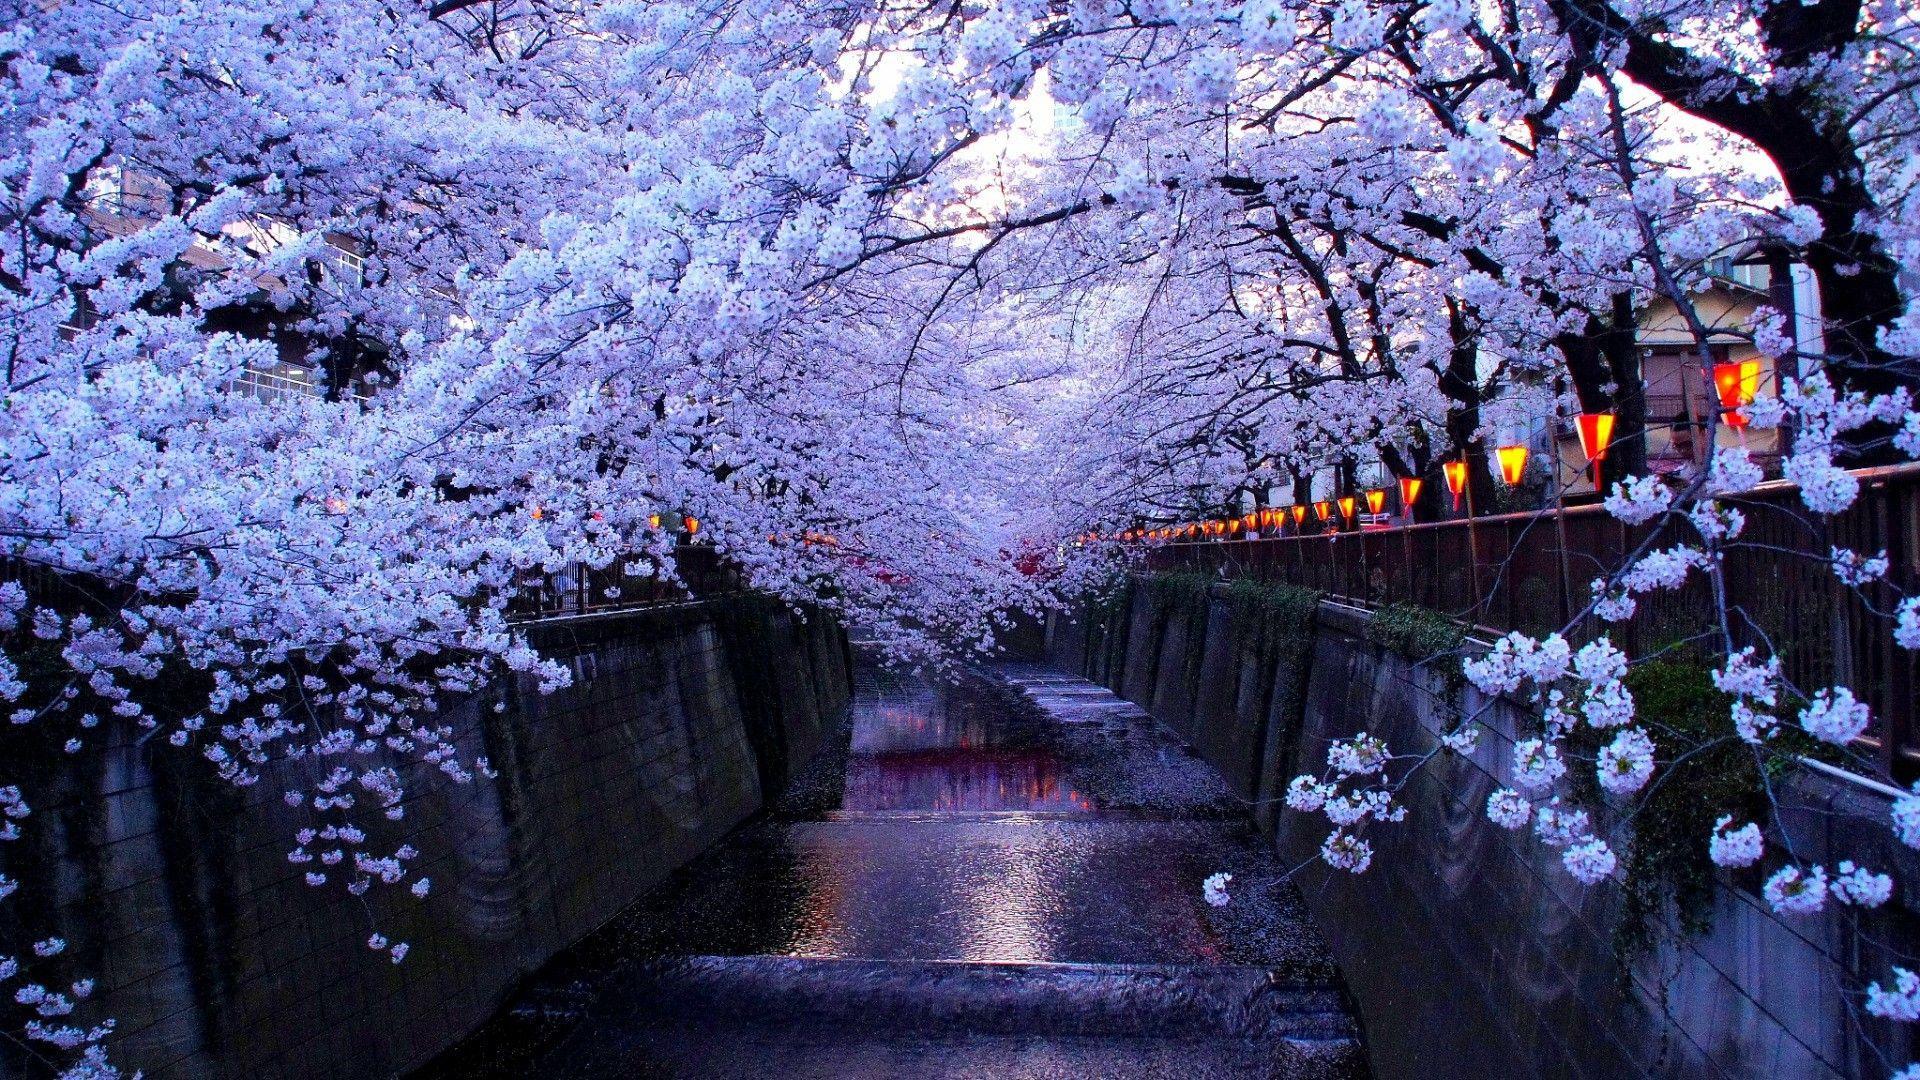 Sakura Blossoms Anime Wallpapers - Wallpaper Cave